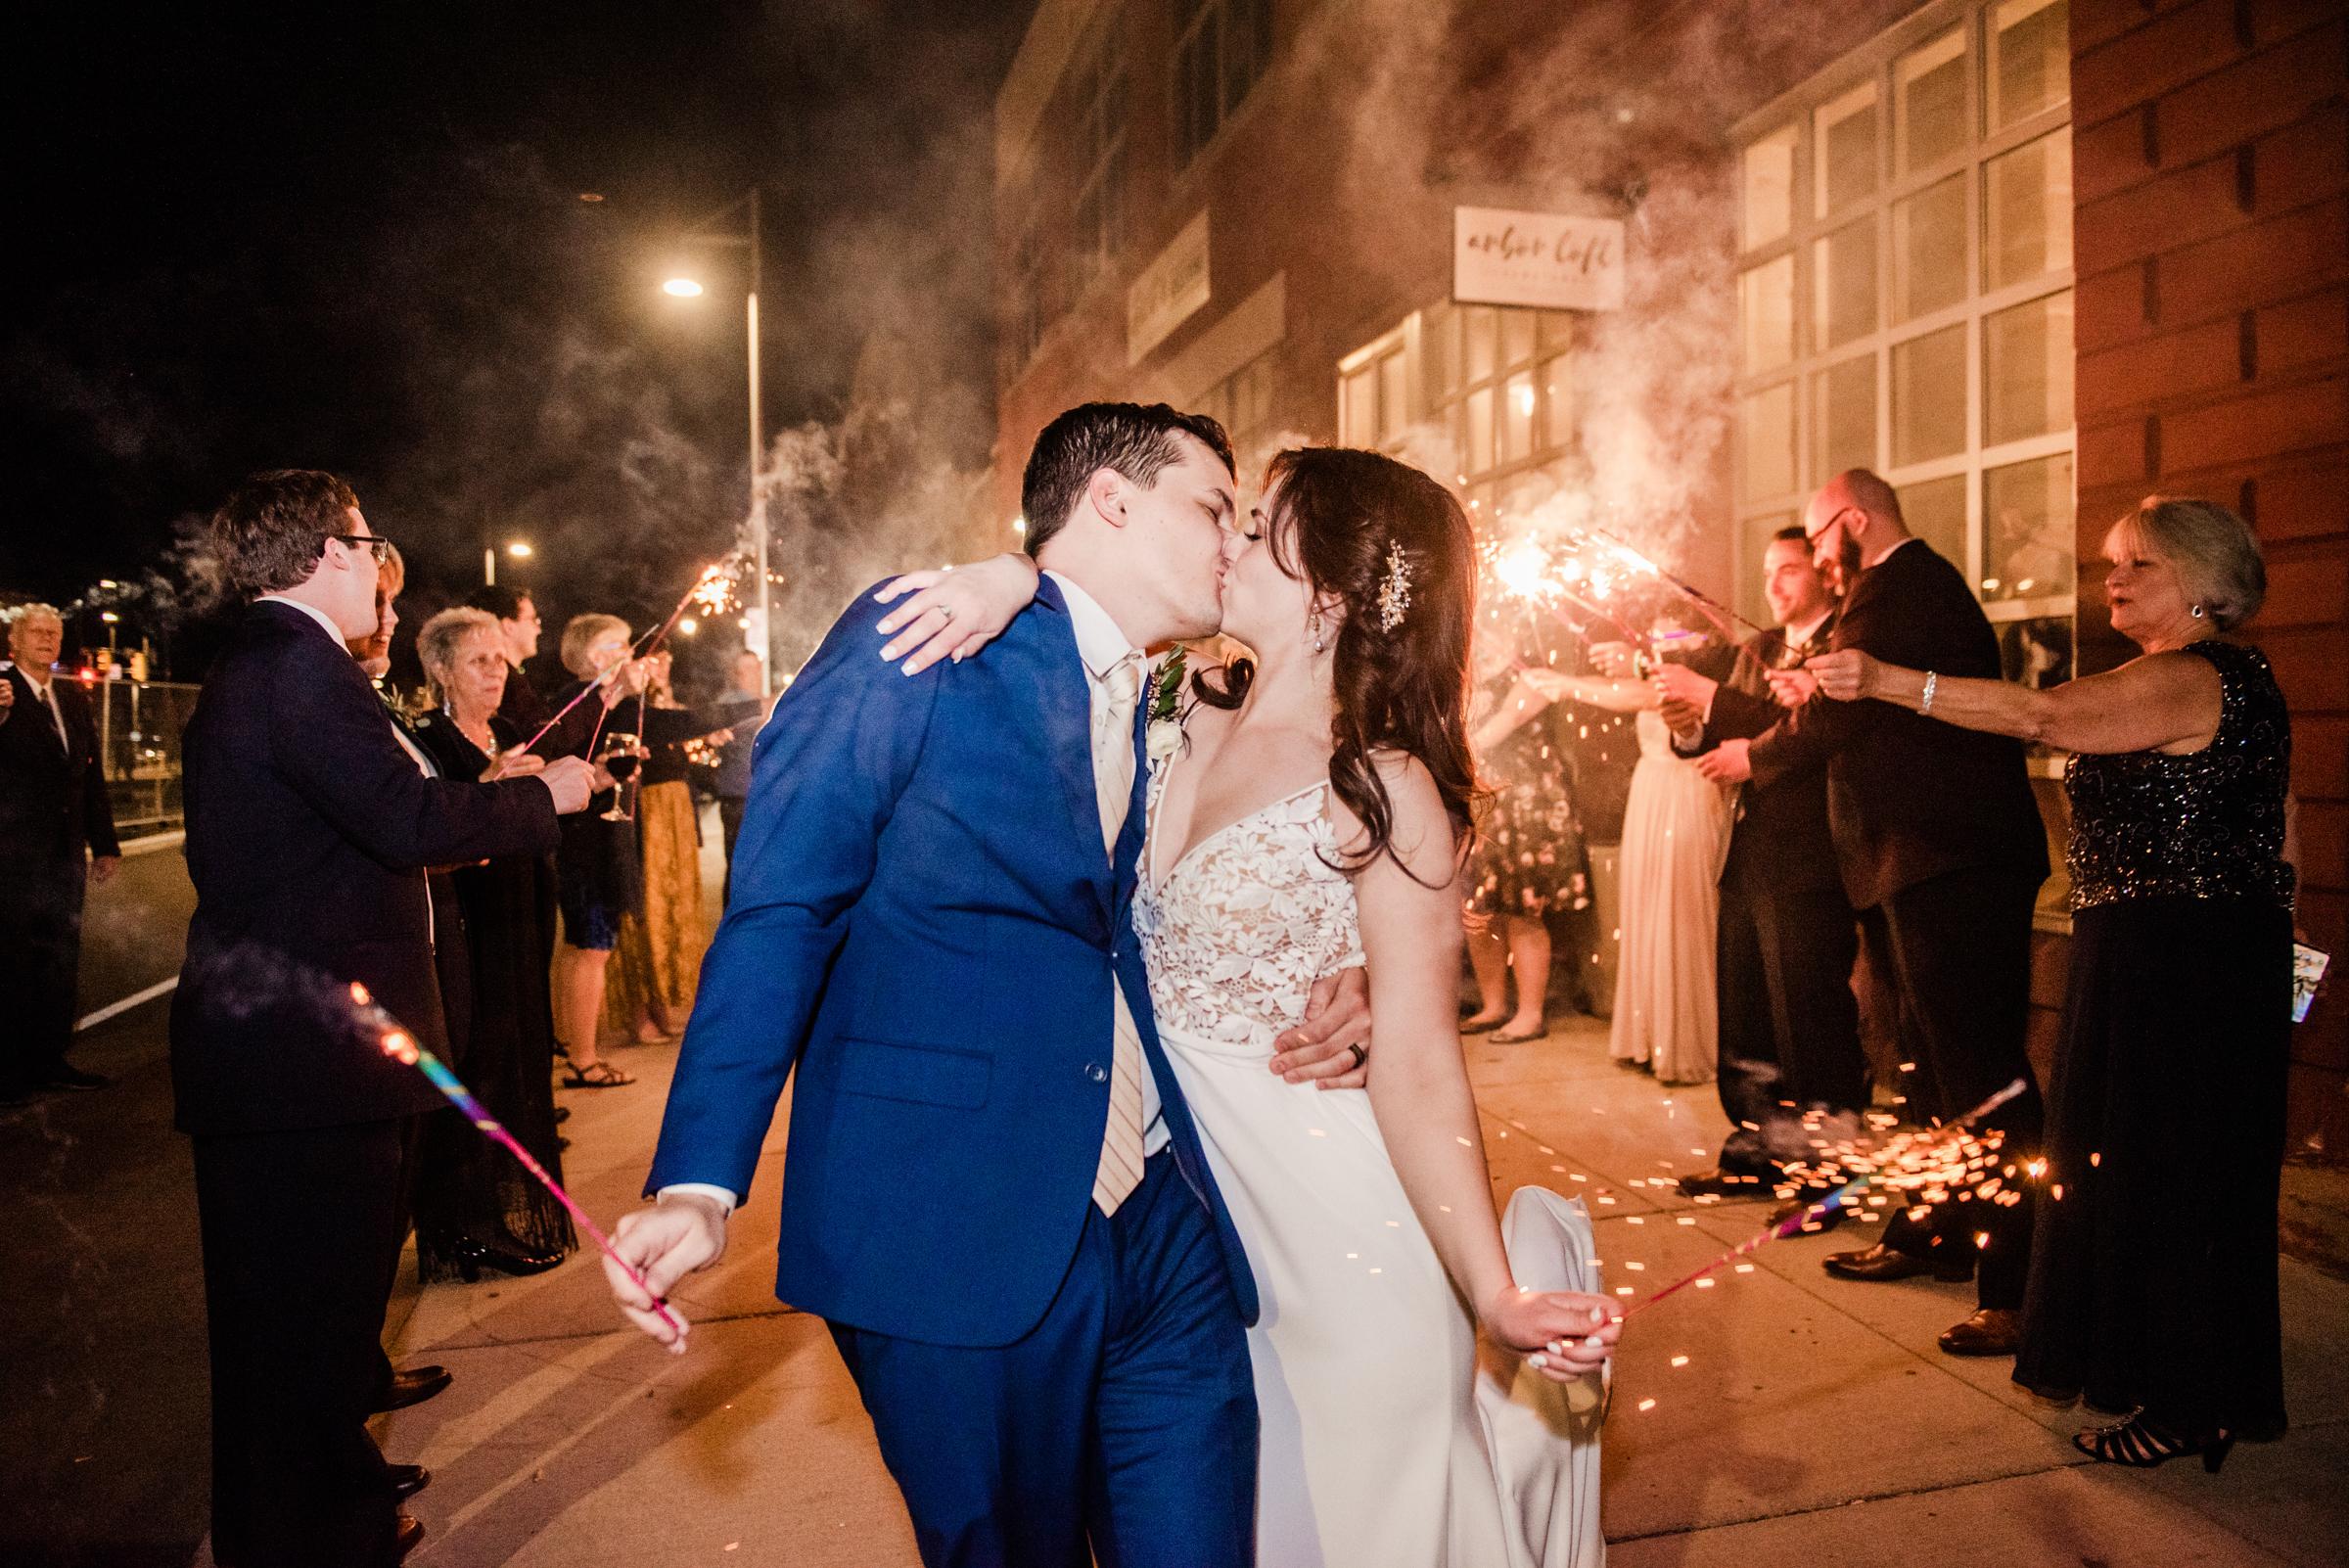 The_Arbor_LoftRochester_Wedding_JILL_STUDIO_Rochester_NY_Photographer_205223.jpg